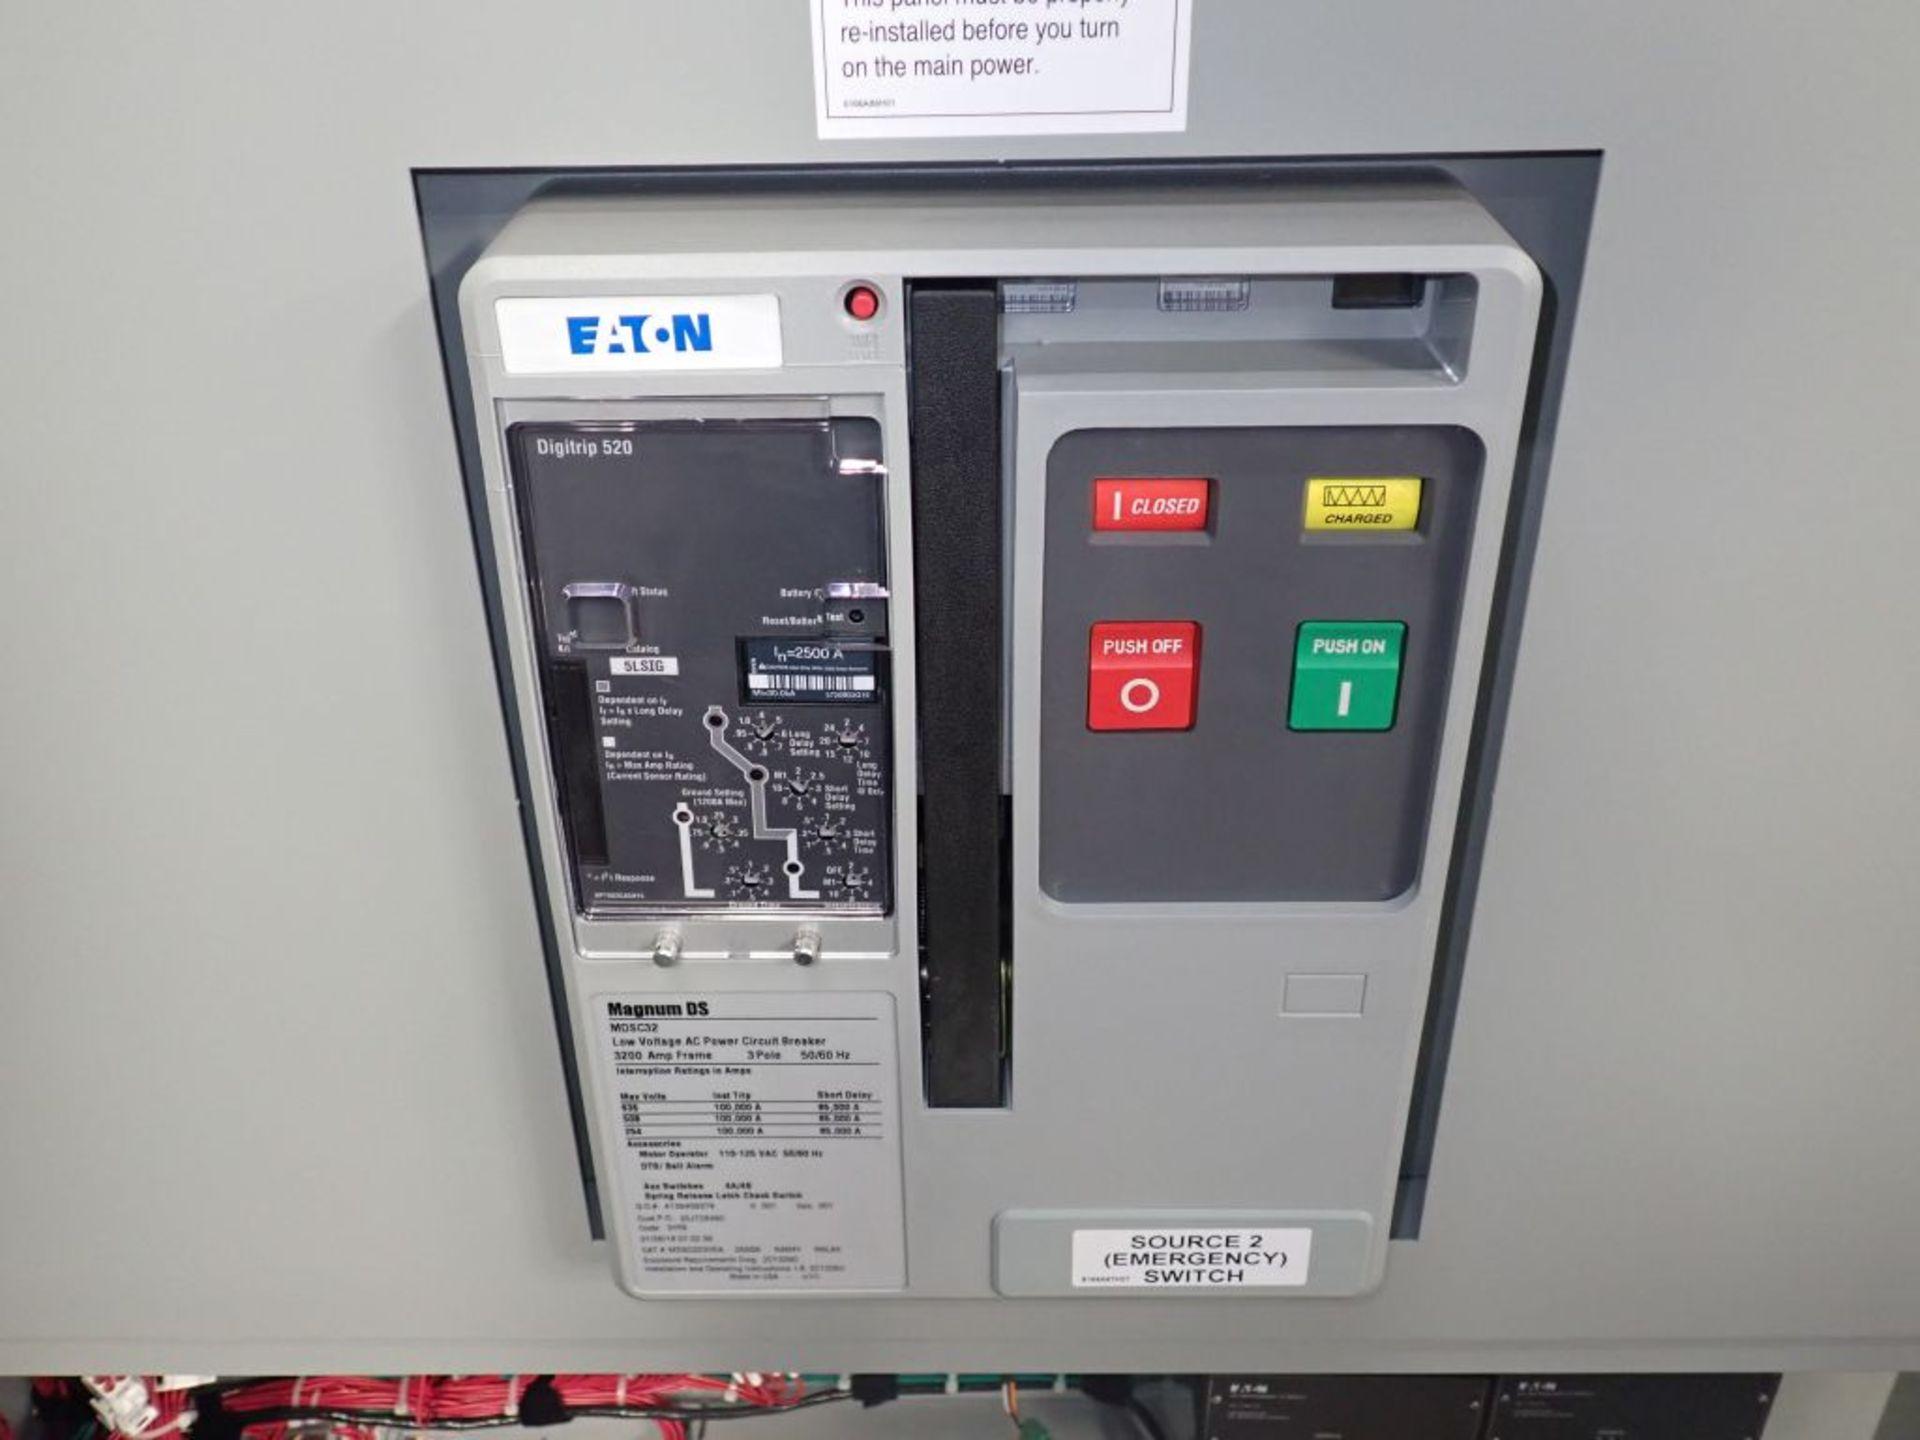 Eaton Transfer Switch | Cat No. ATV9MGB32500XSU; 480V; 3 PH; 2500A; (2) Eaton Magnum DS Circuit - Image 14 of 50